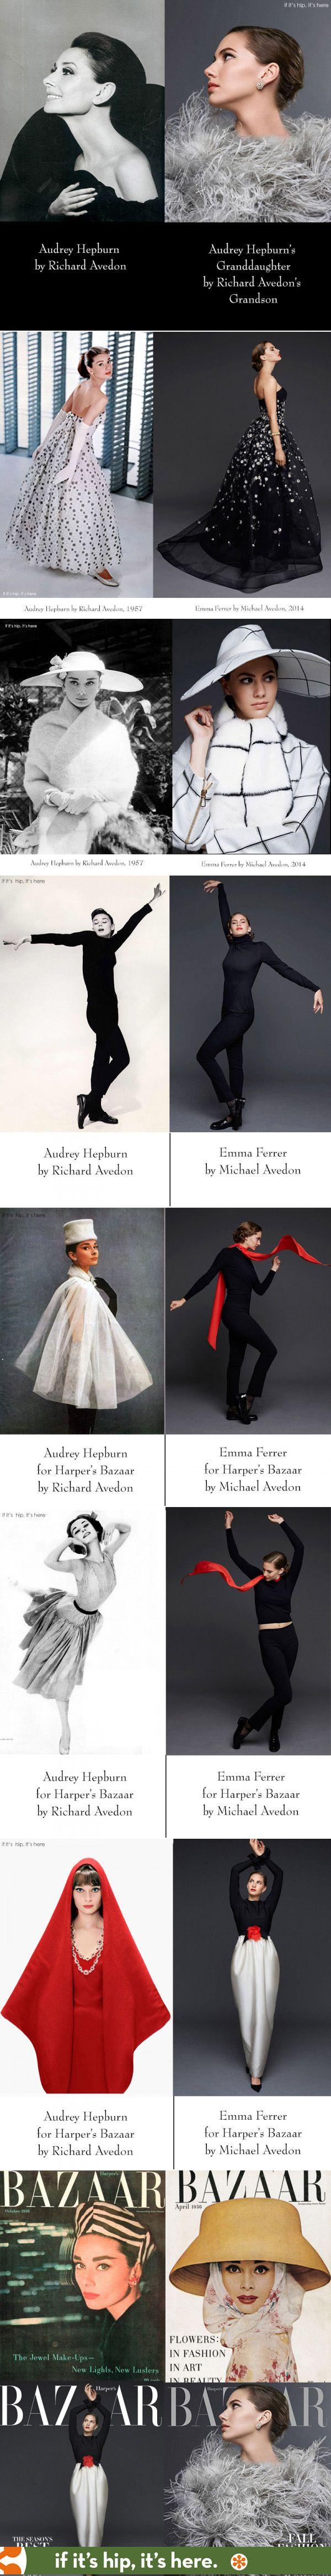 Audrey Hepburn by Richard Avedon & Emma Ferrer (Audrey's granddaughter) by Michael Avedon (Richard's grandson).